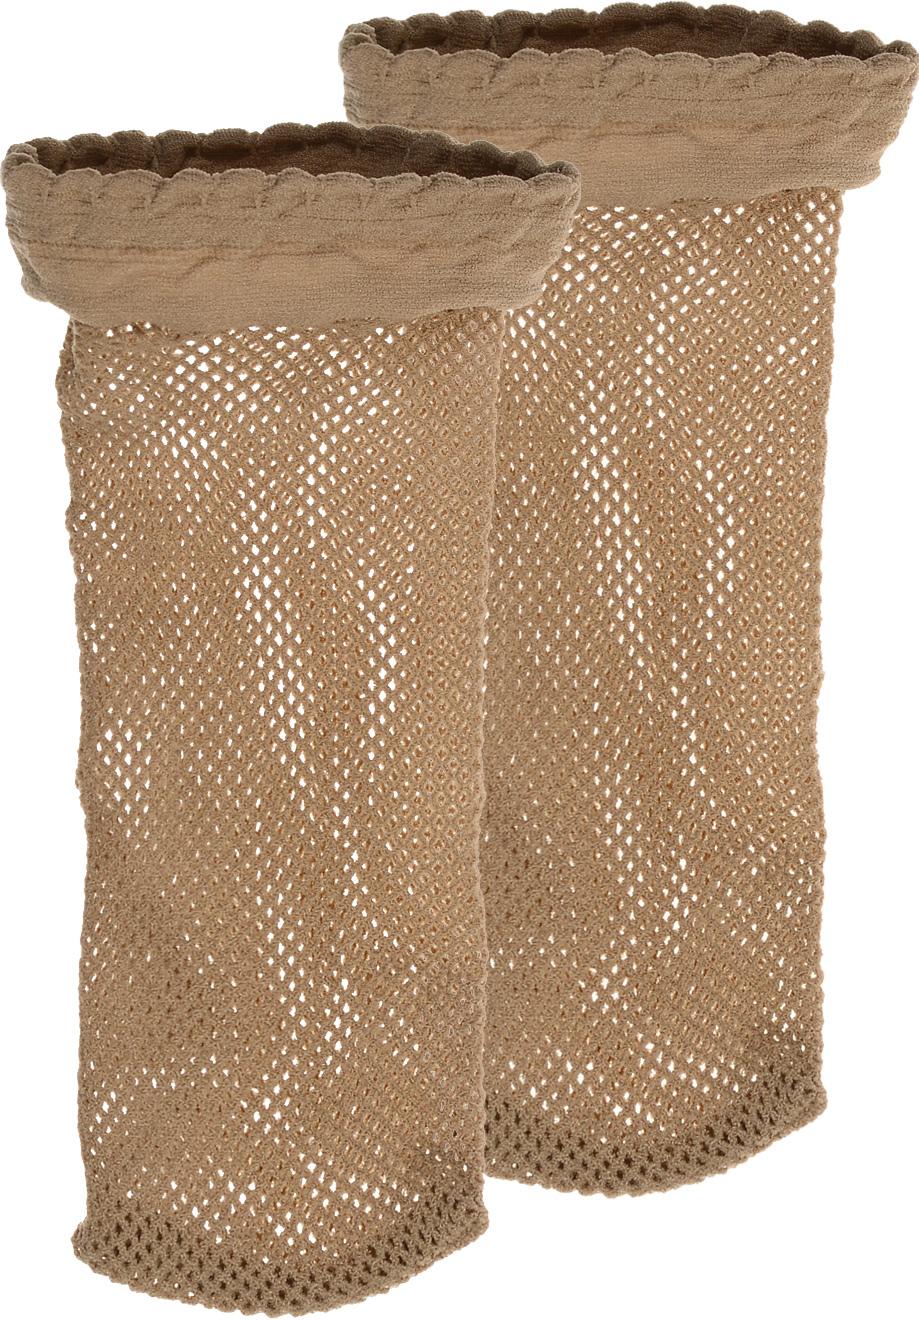 Носки женские Microrete 20, 2 пары. 7819